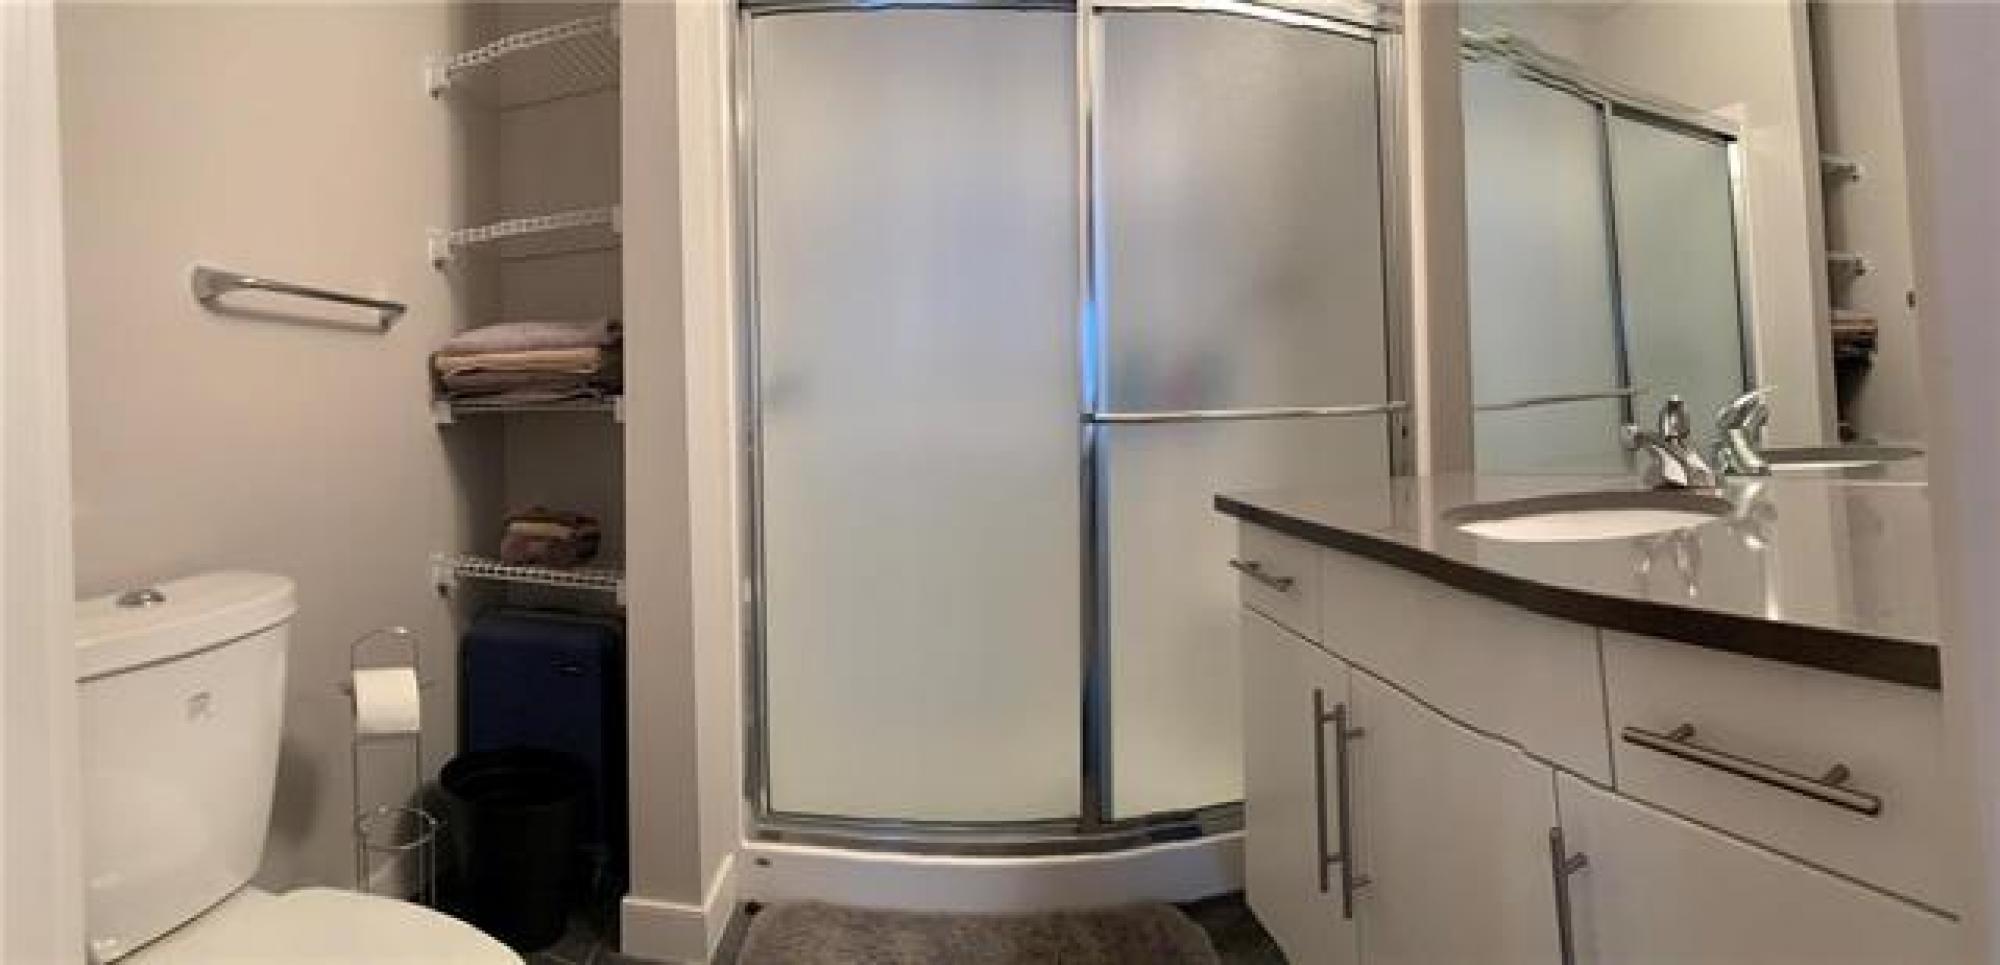 208-80 Barnes Street, R3T 3N7, 2 Bedroom for sale South ...